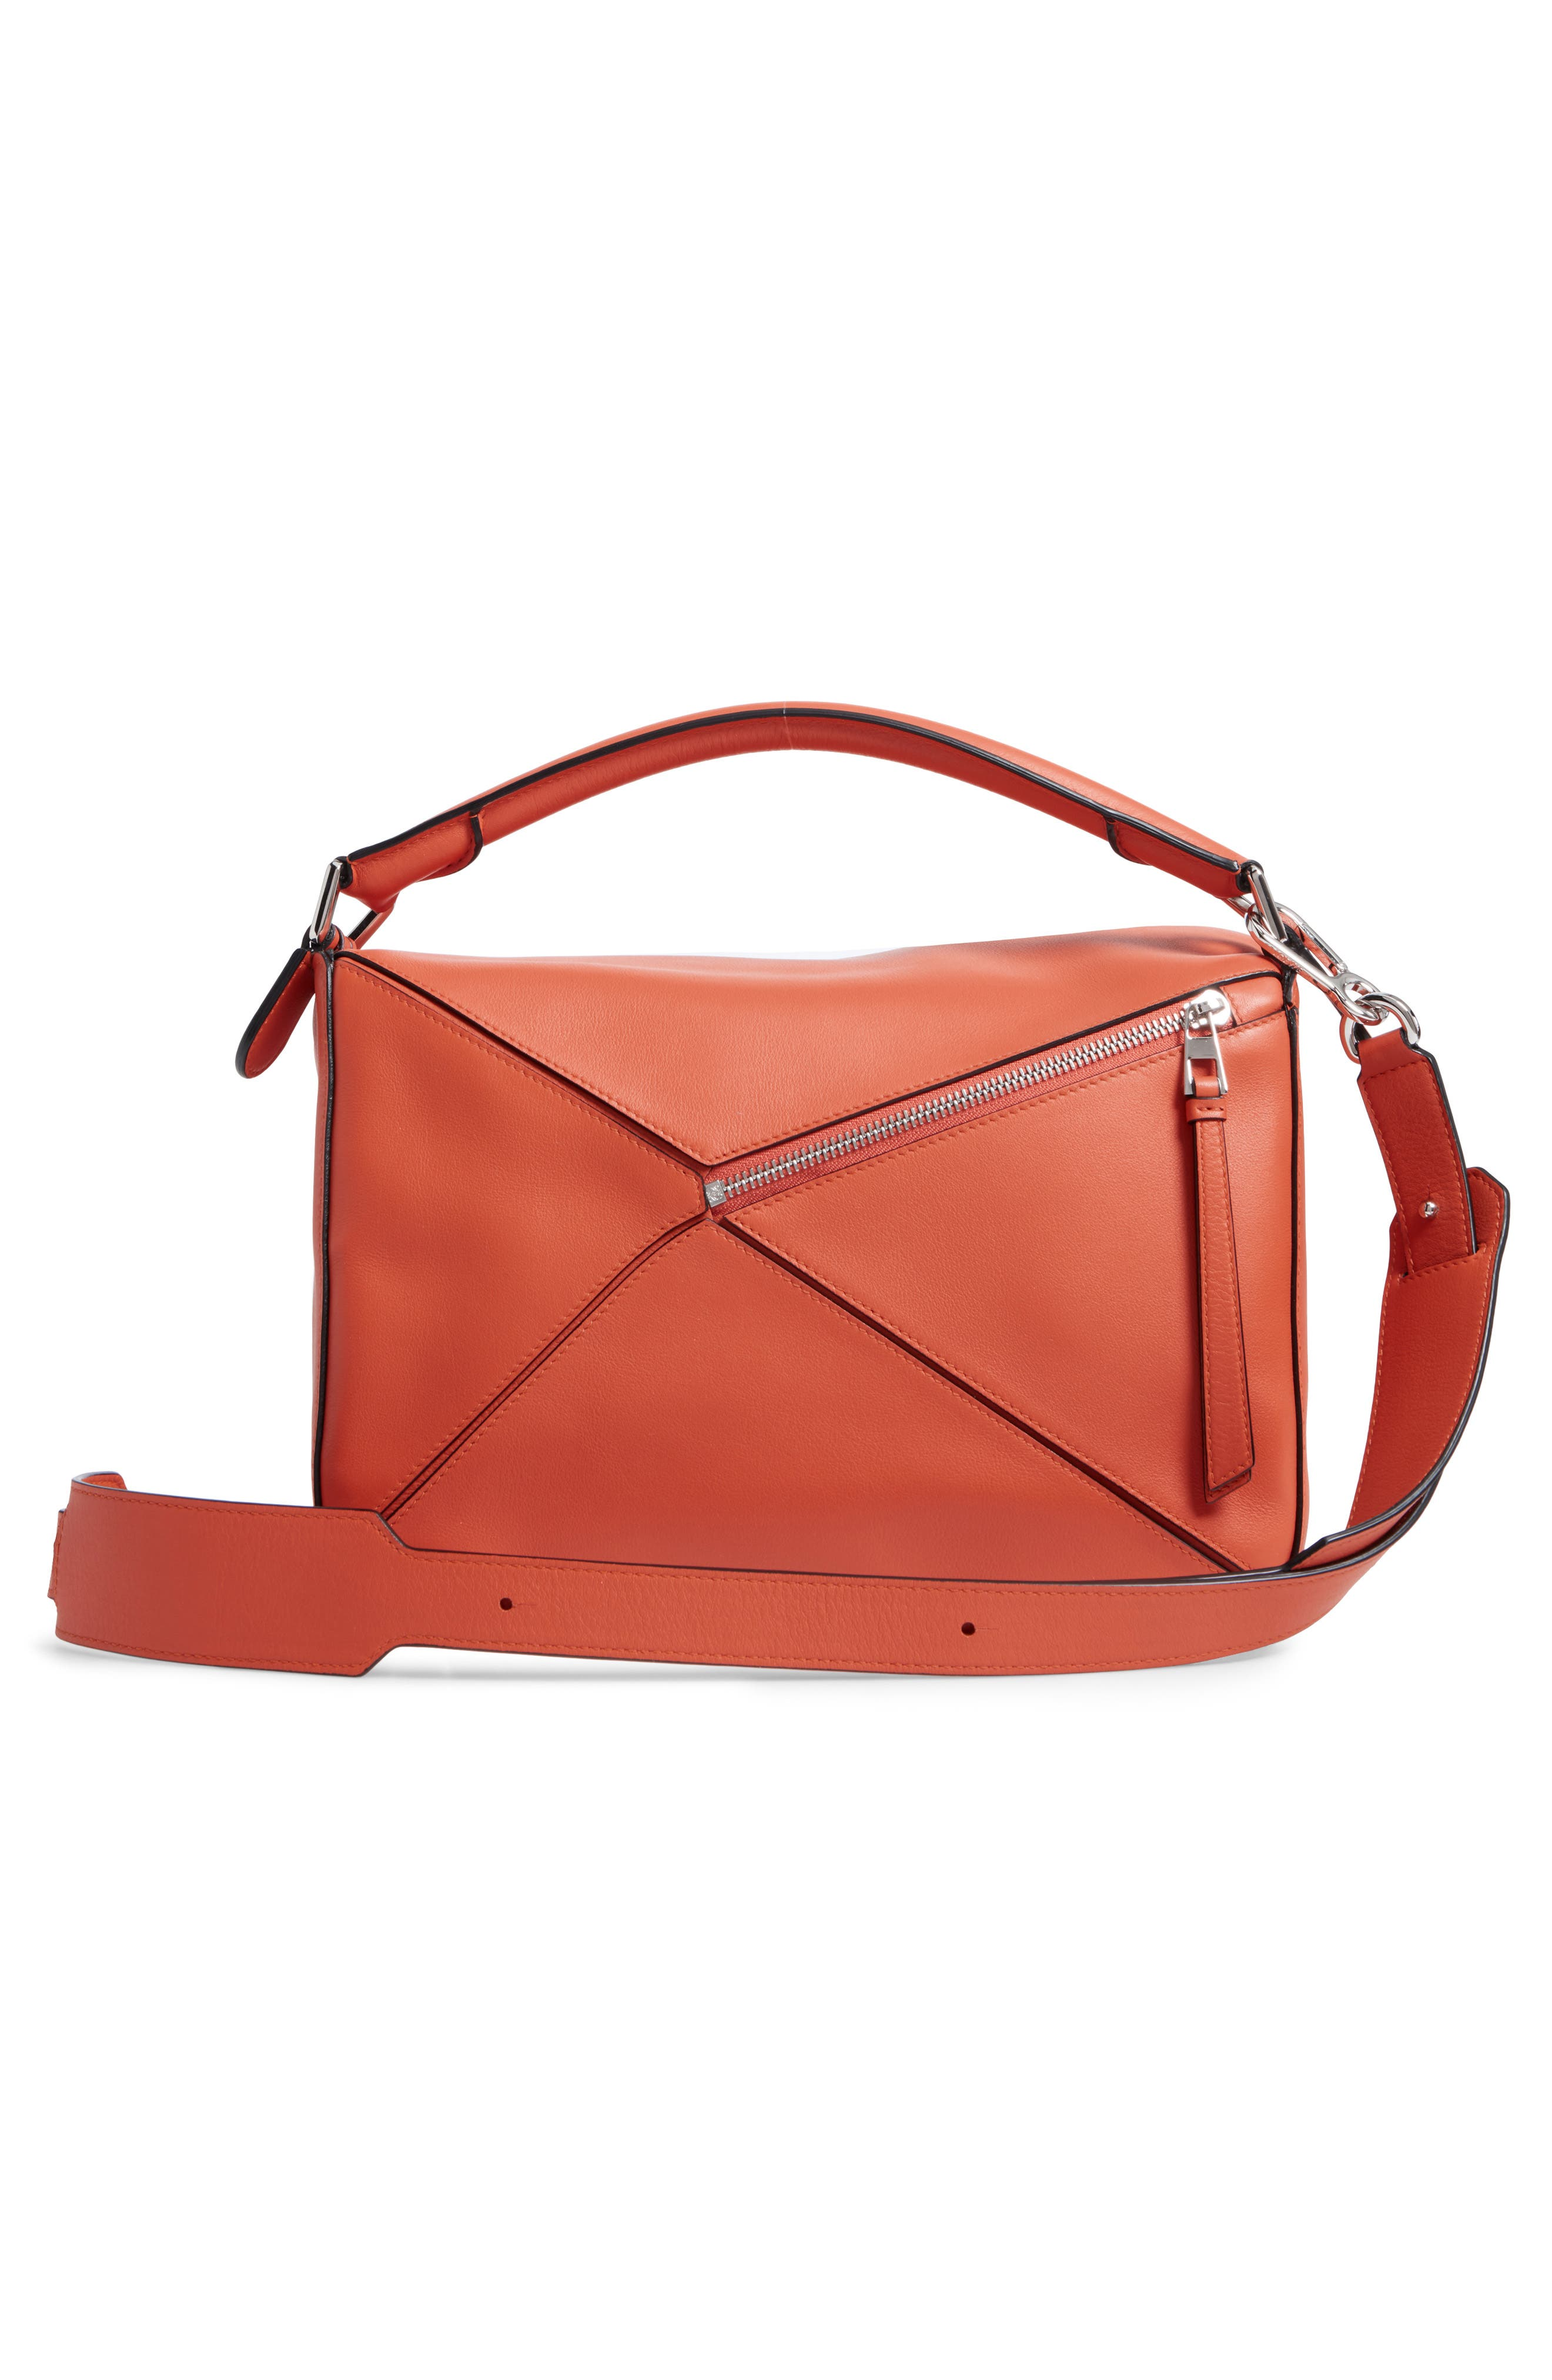 Alternate Image 3  - Loewe 'Small Puzzle' Calfskin Leather Bag